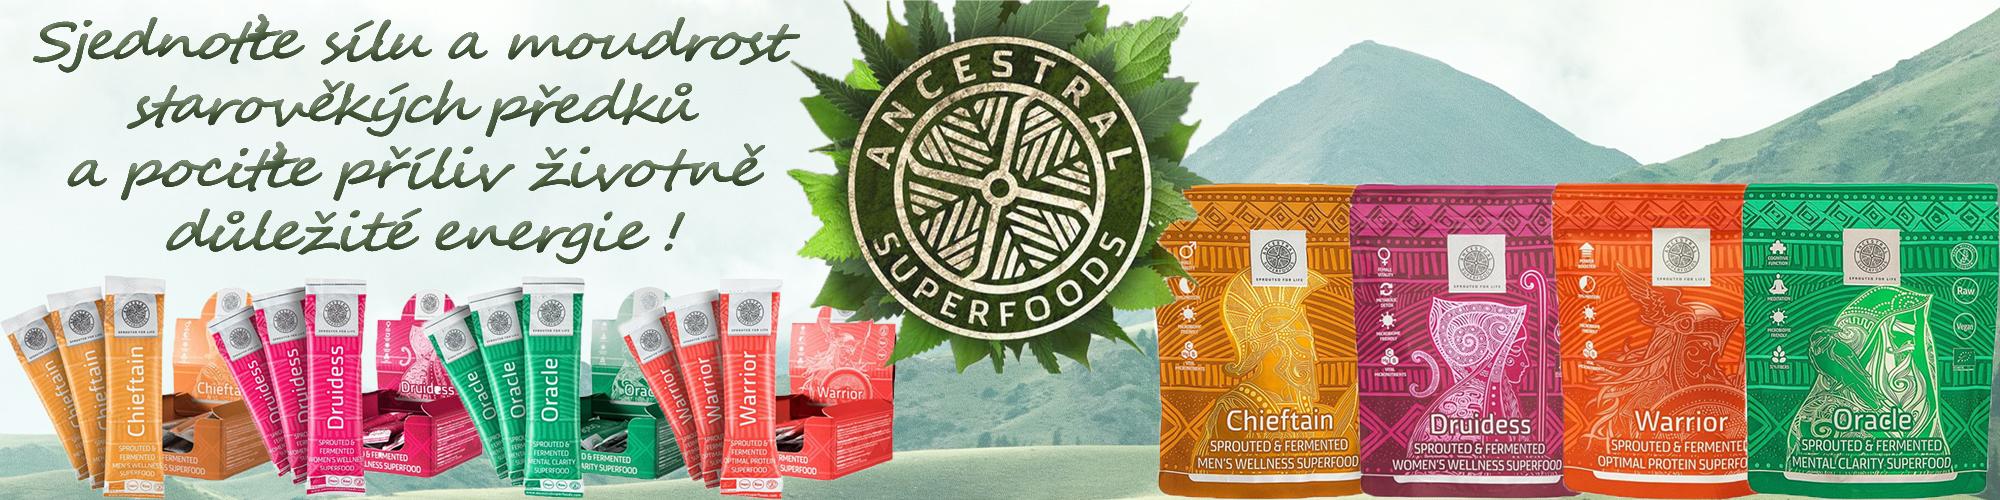 Ancestral Superfoods